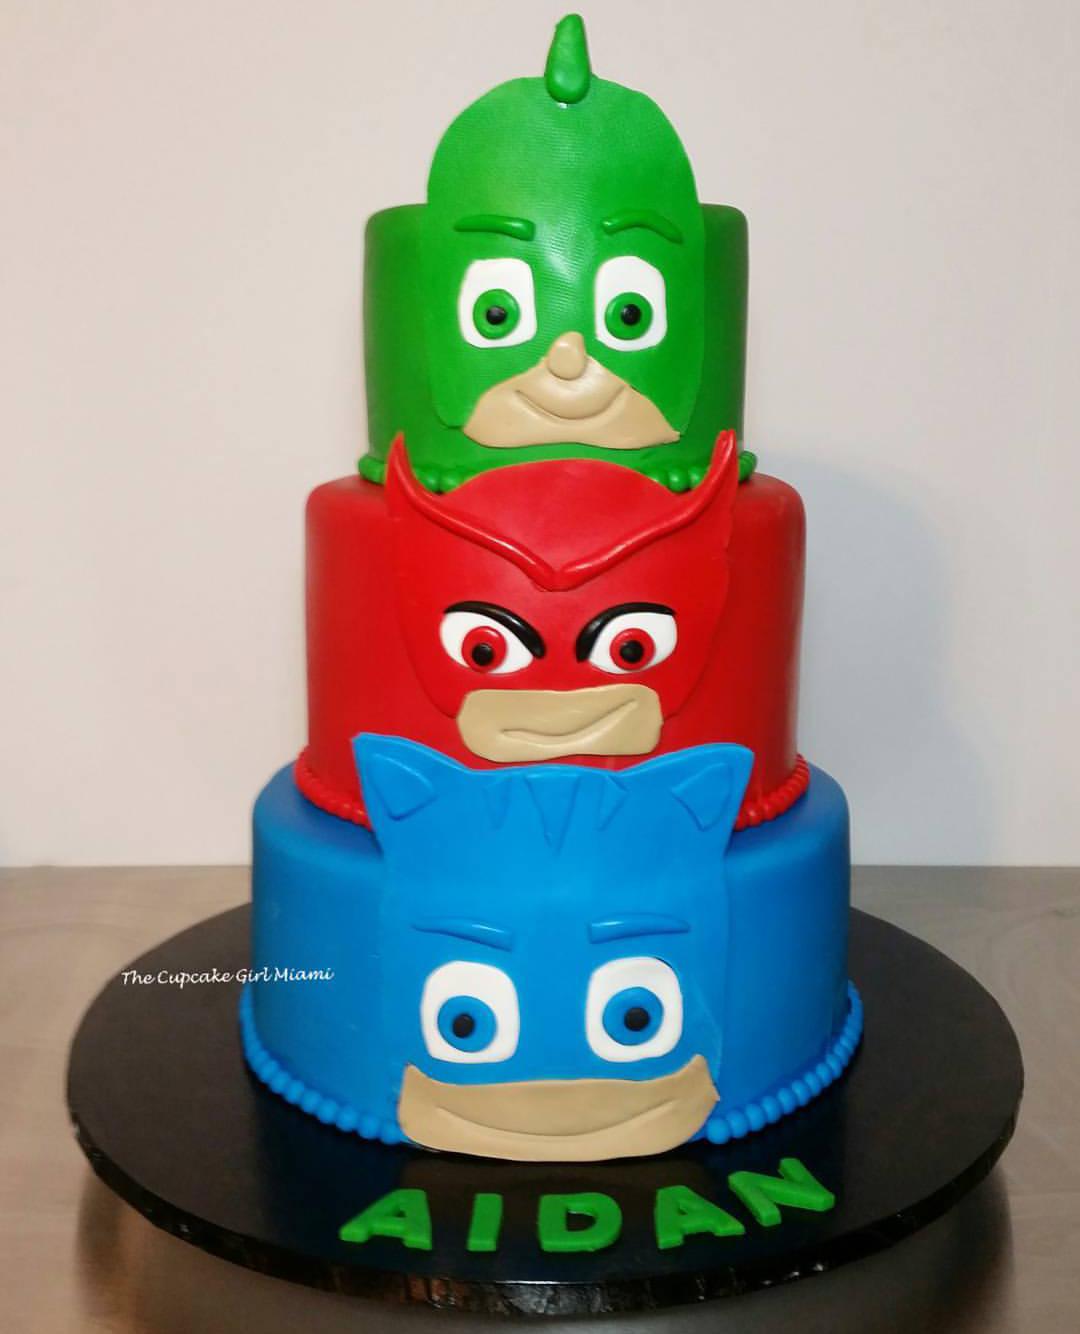 Fabulous Birthday Cakes Wedding Cakes Baby Shower Cakes The Cupcake Personalised Birthday Cards Paralily Jamesorg